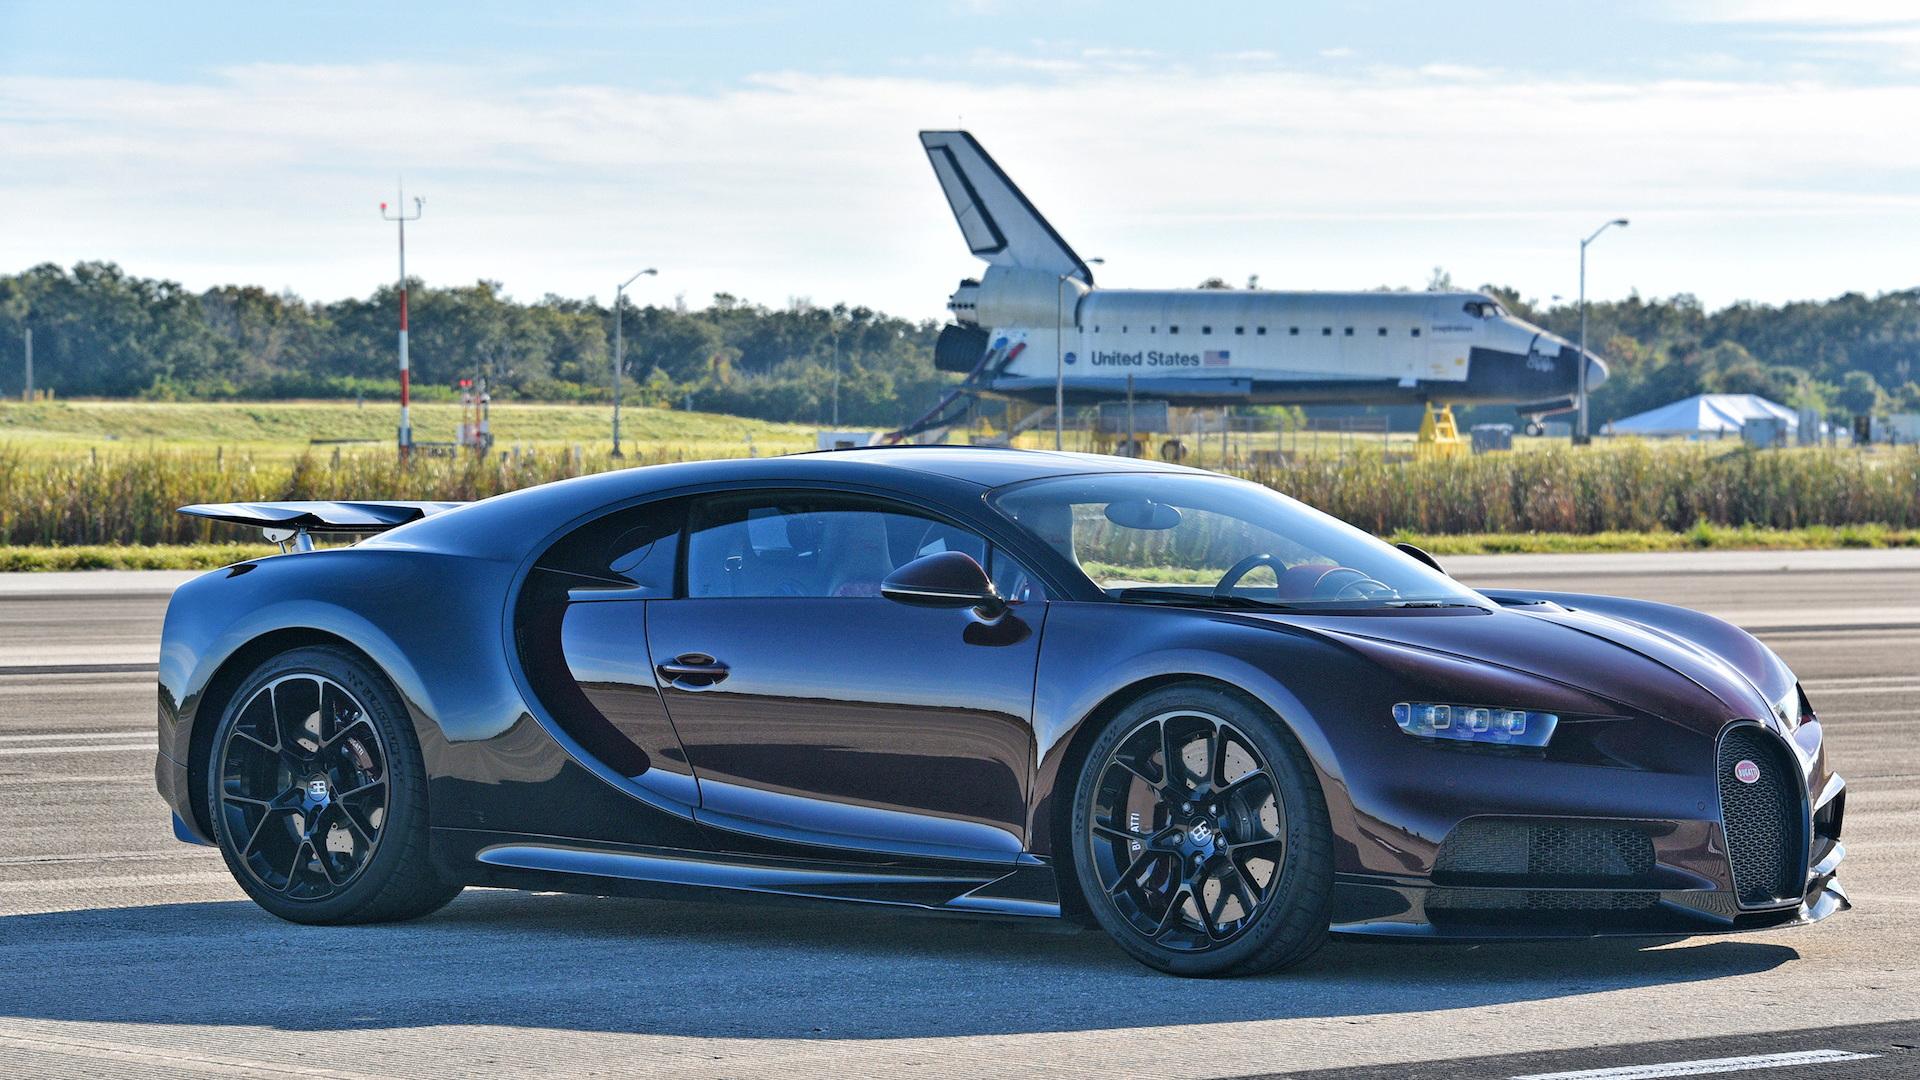 Bugatti Chiron test with astronaut Jon A. McBride